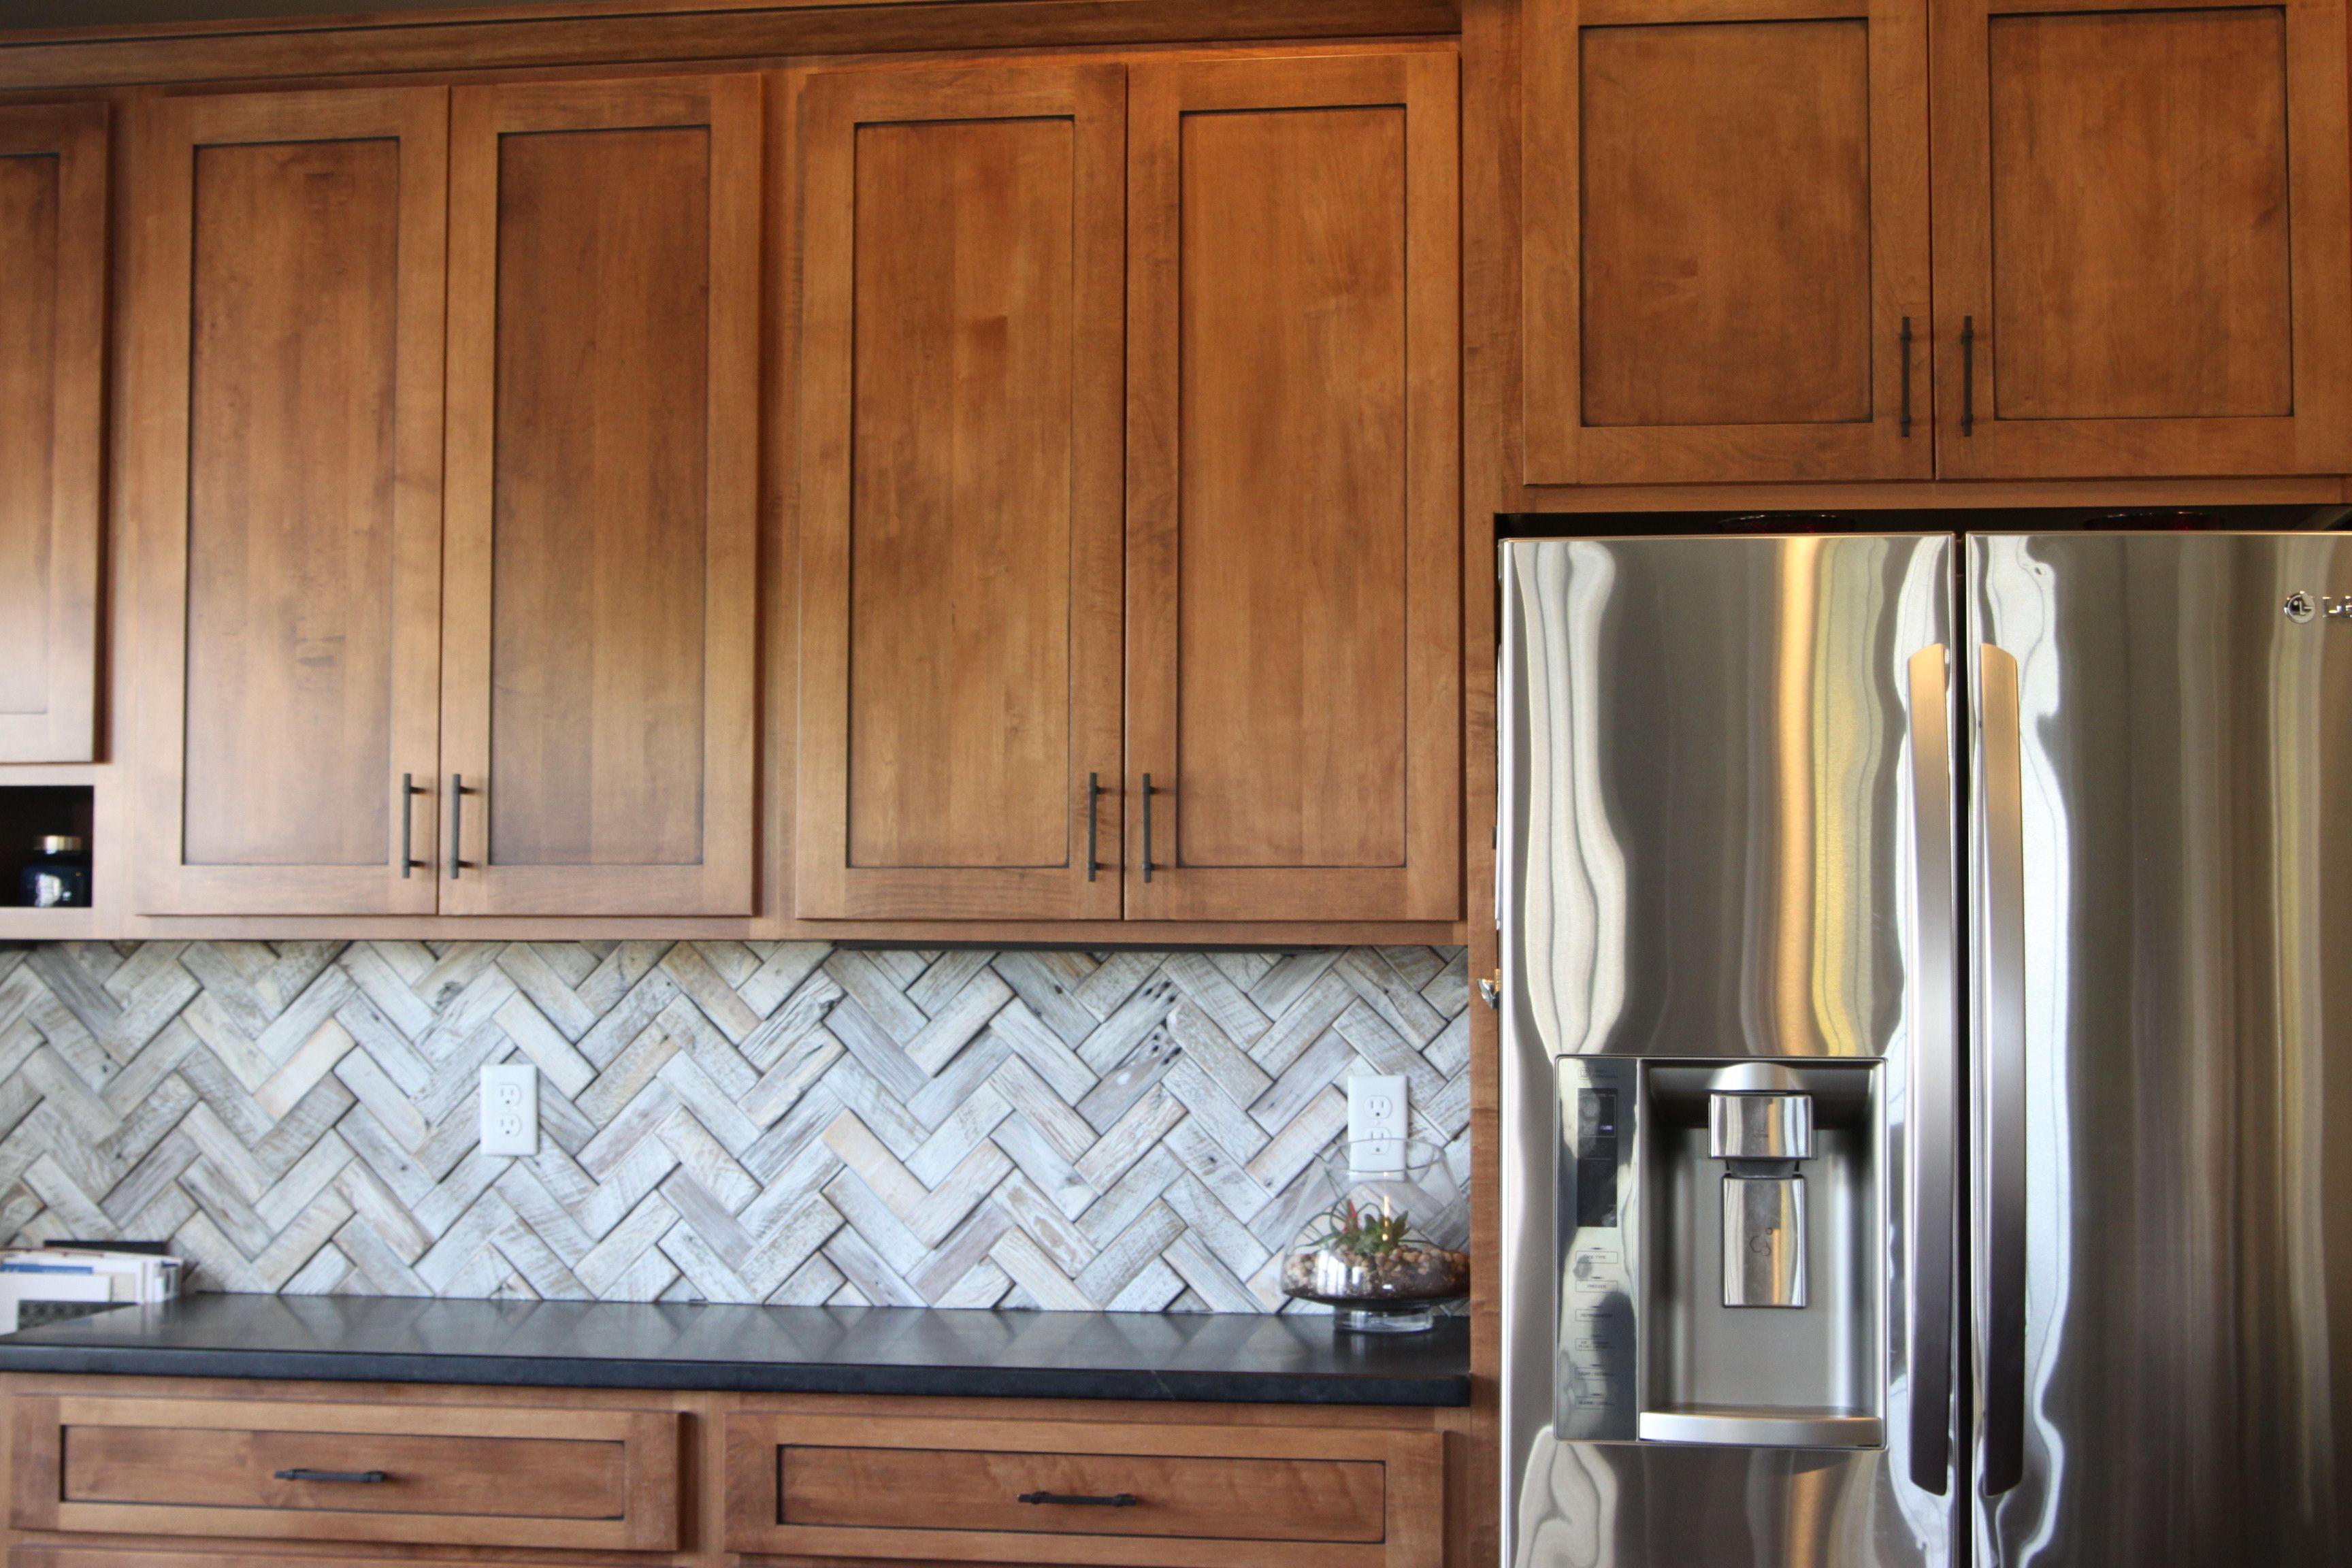 Herringbone Backsplash Wood Tile Kitchen Backsplash Wood Tile